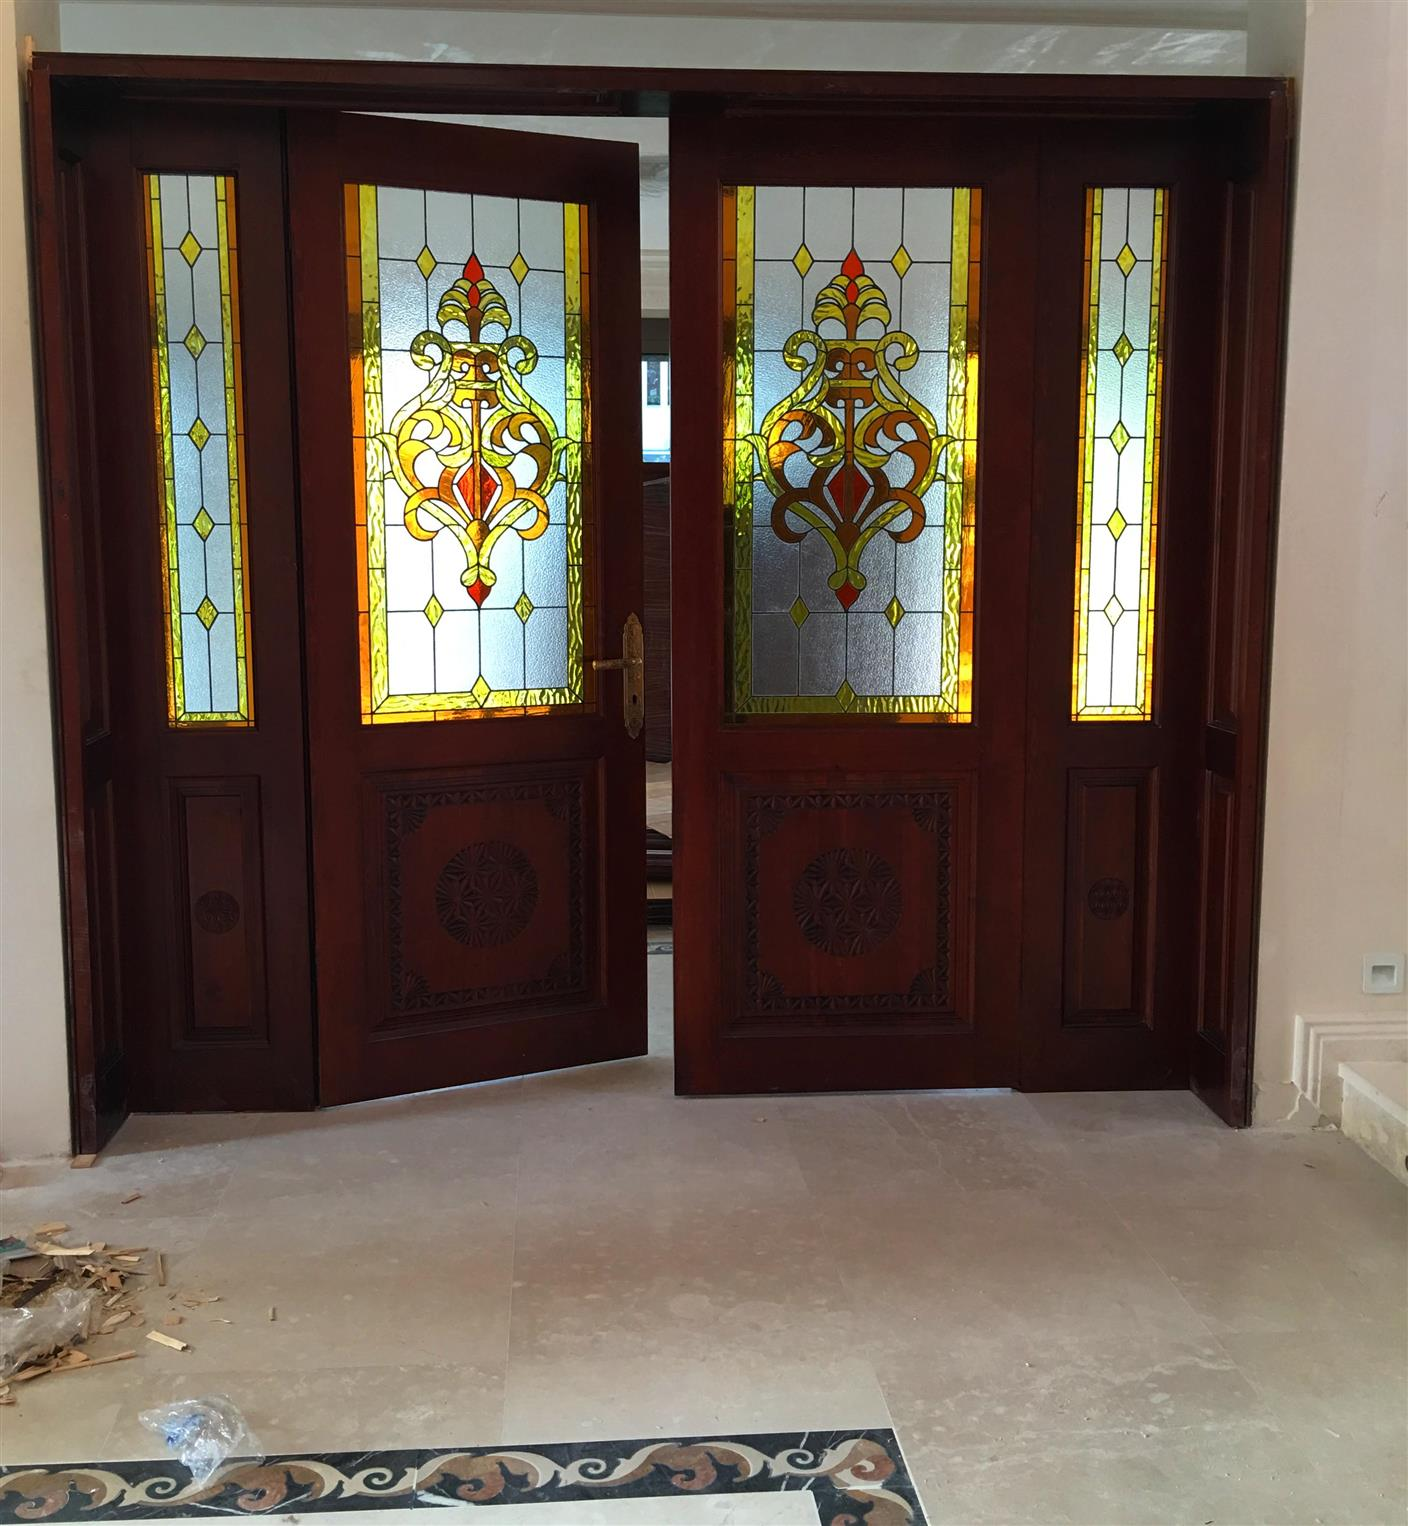 hamam-banyo-tavan-vitraylari2017122118534611.jpg izmir vitray çalışması